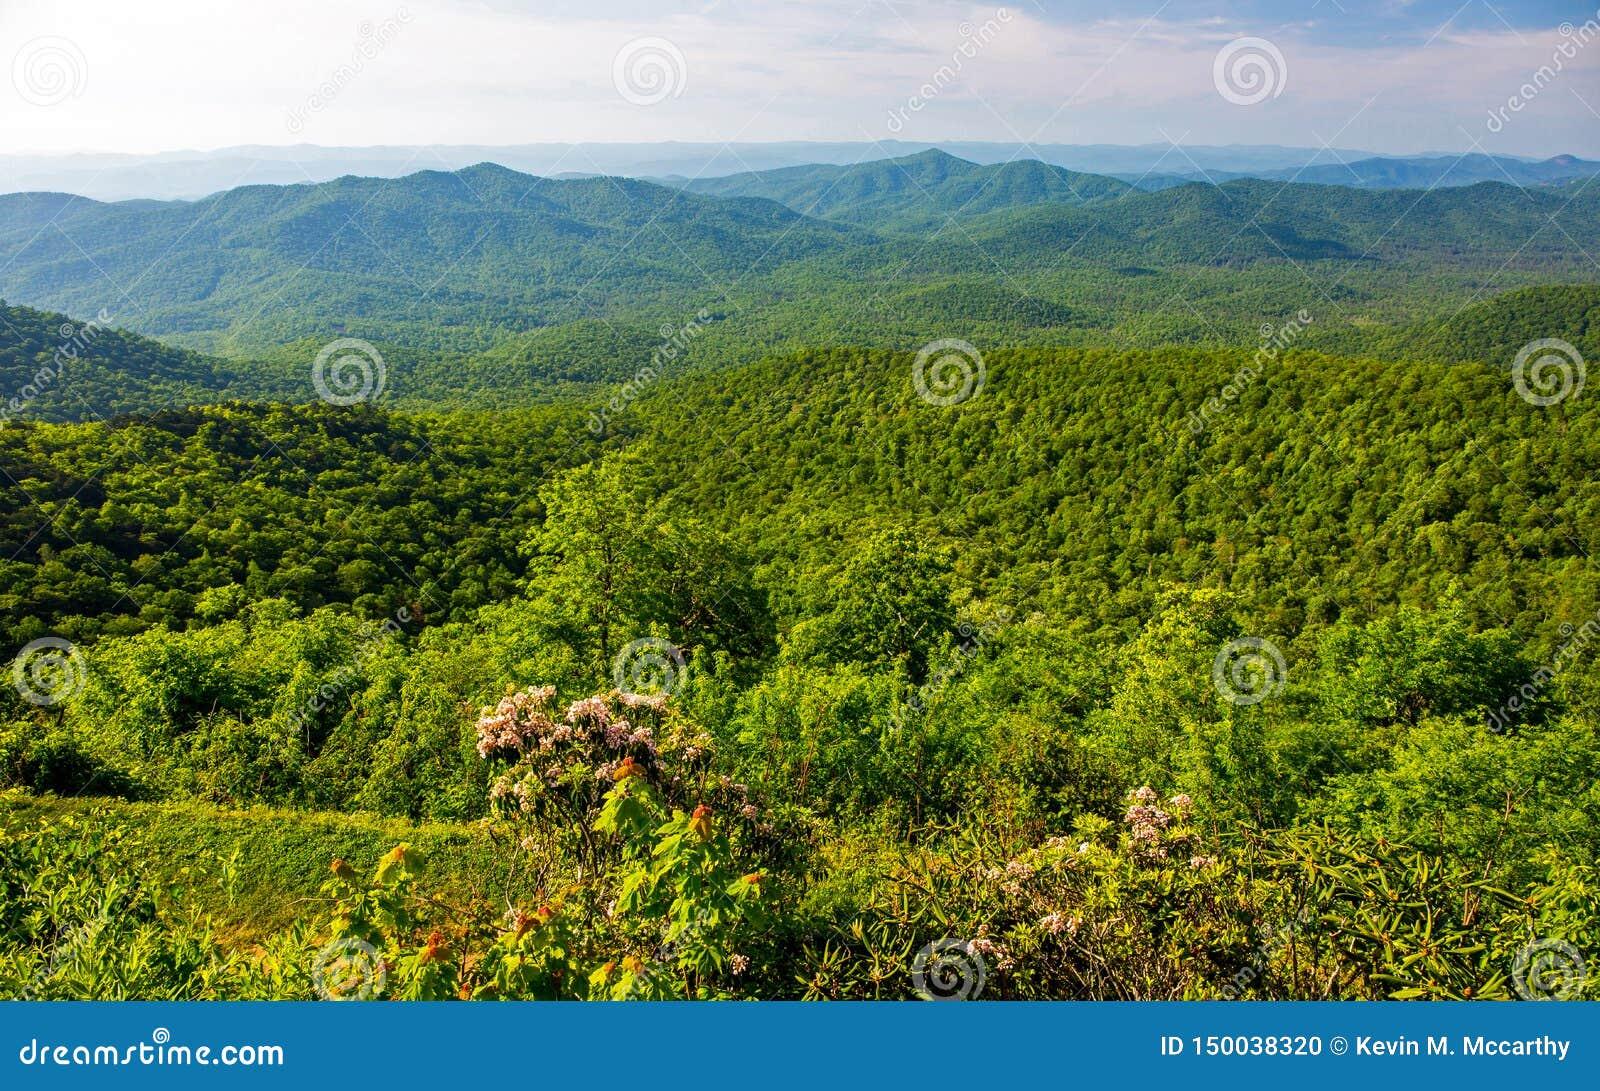 Blue Ridge Mountain Overlook In North Carolina Stock Photo